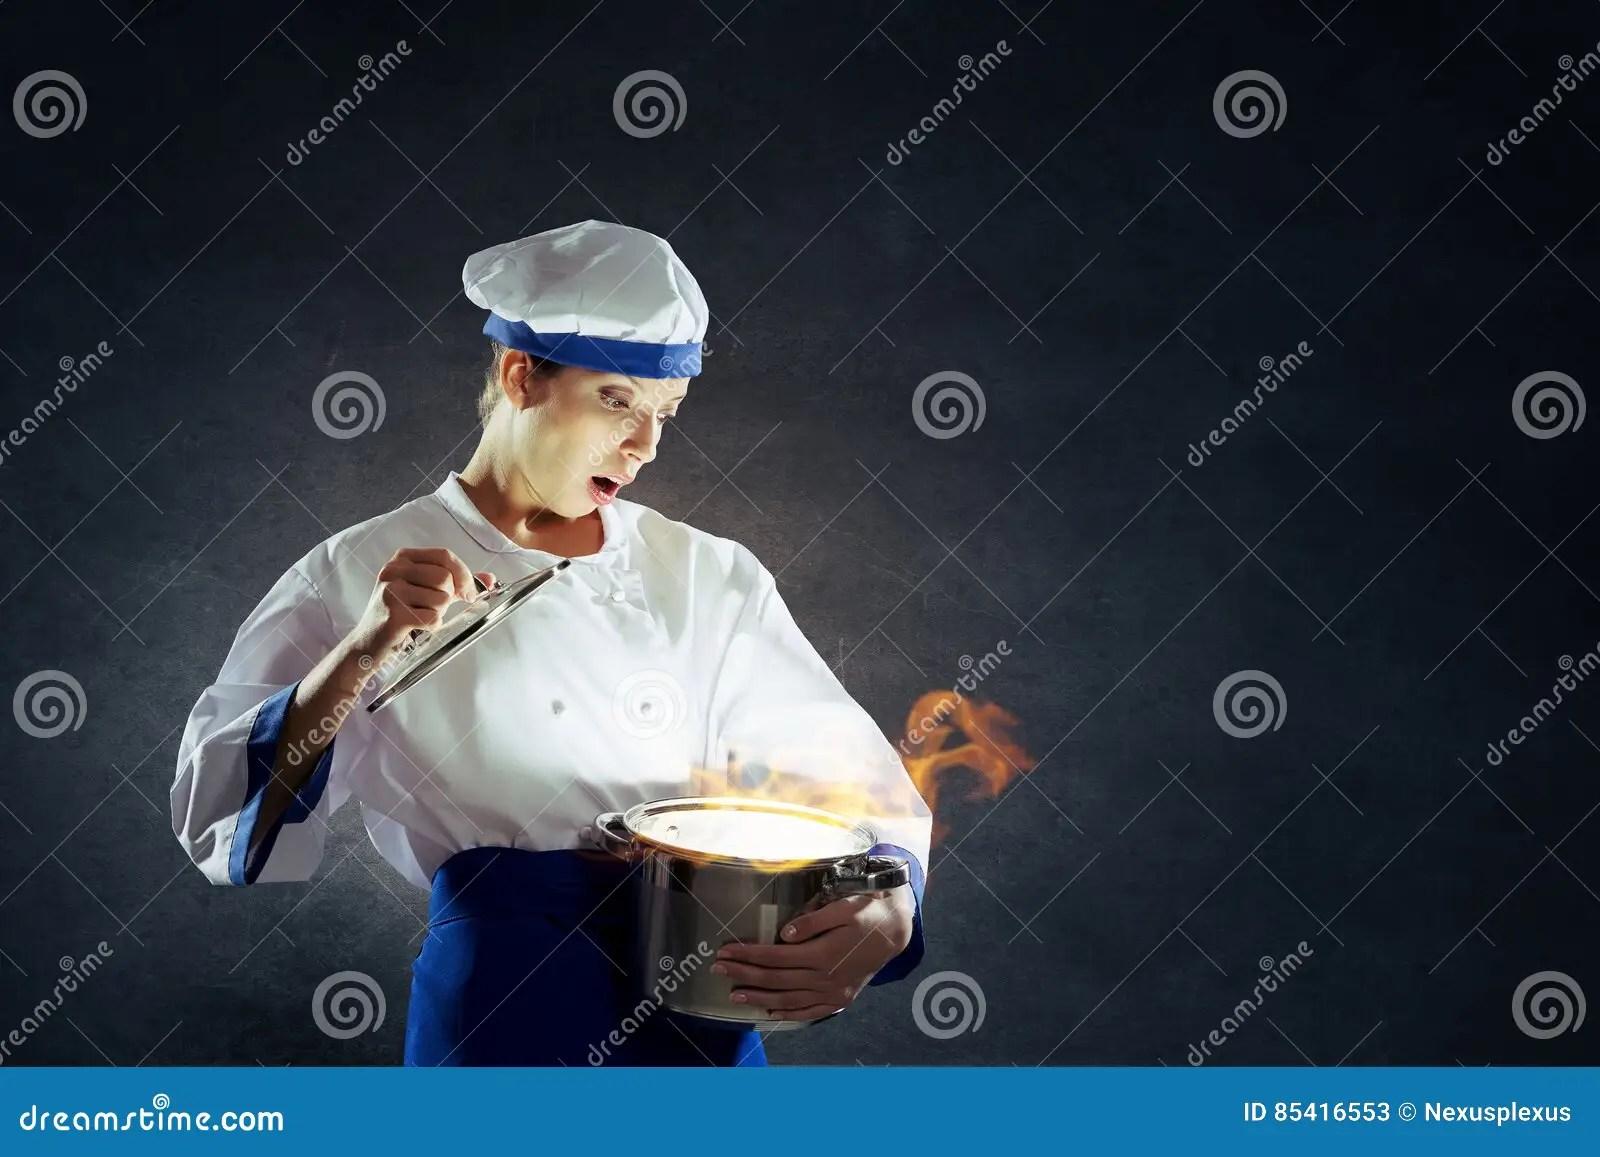 kitchen magician aid dishwasher reviews 她是魔术师作为厨师混合画法库存图片 图片包括有逗人喜爱 正餐 厨房 做在平底锅上的年轻可爱的厨师妇女魔术